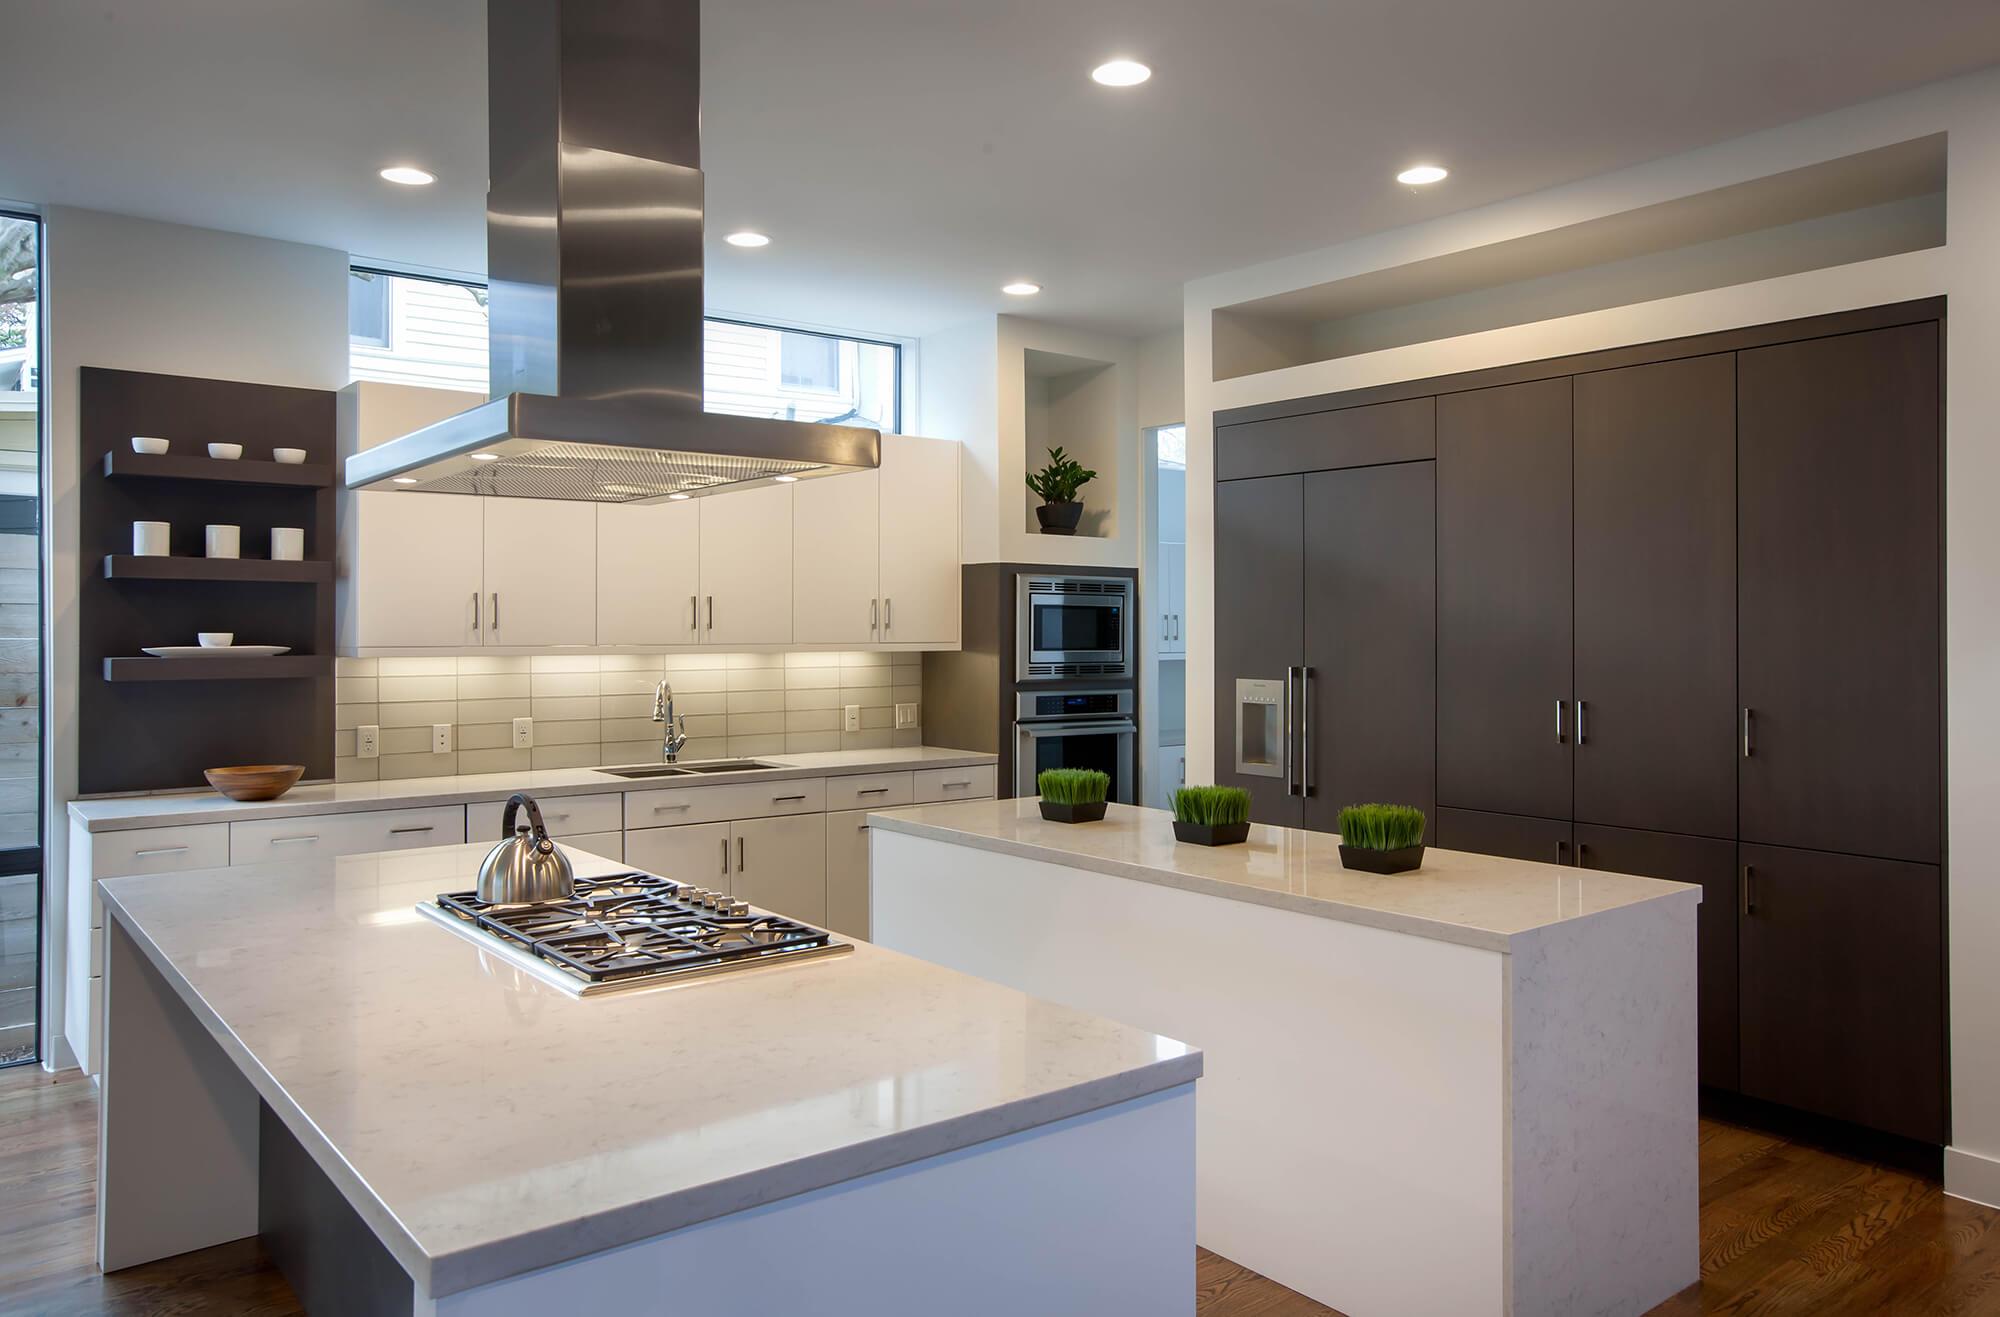 Kitchen & Bath Concepts. Premium Custom Kitchen Cabinets by Wood ...